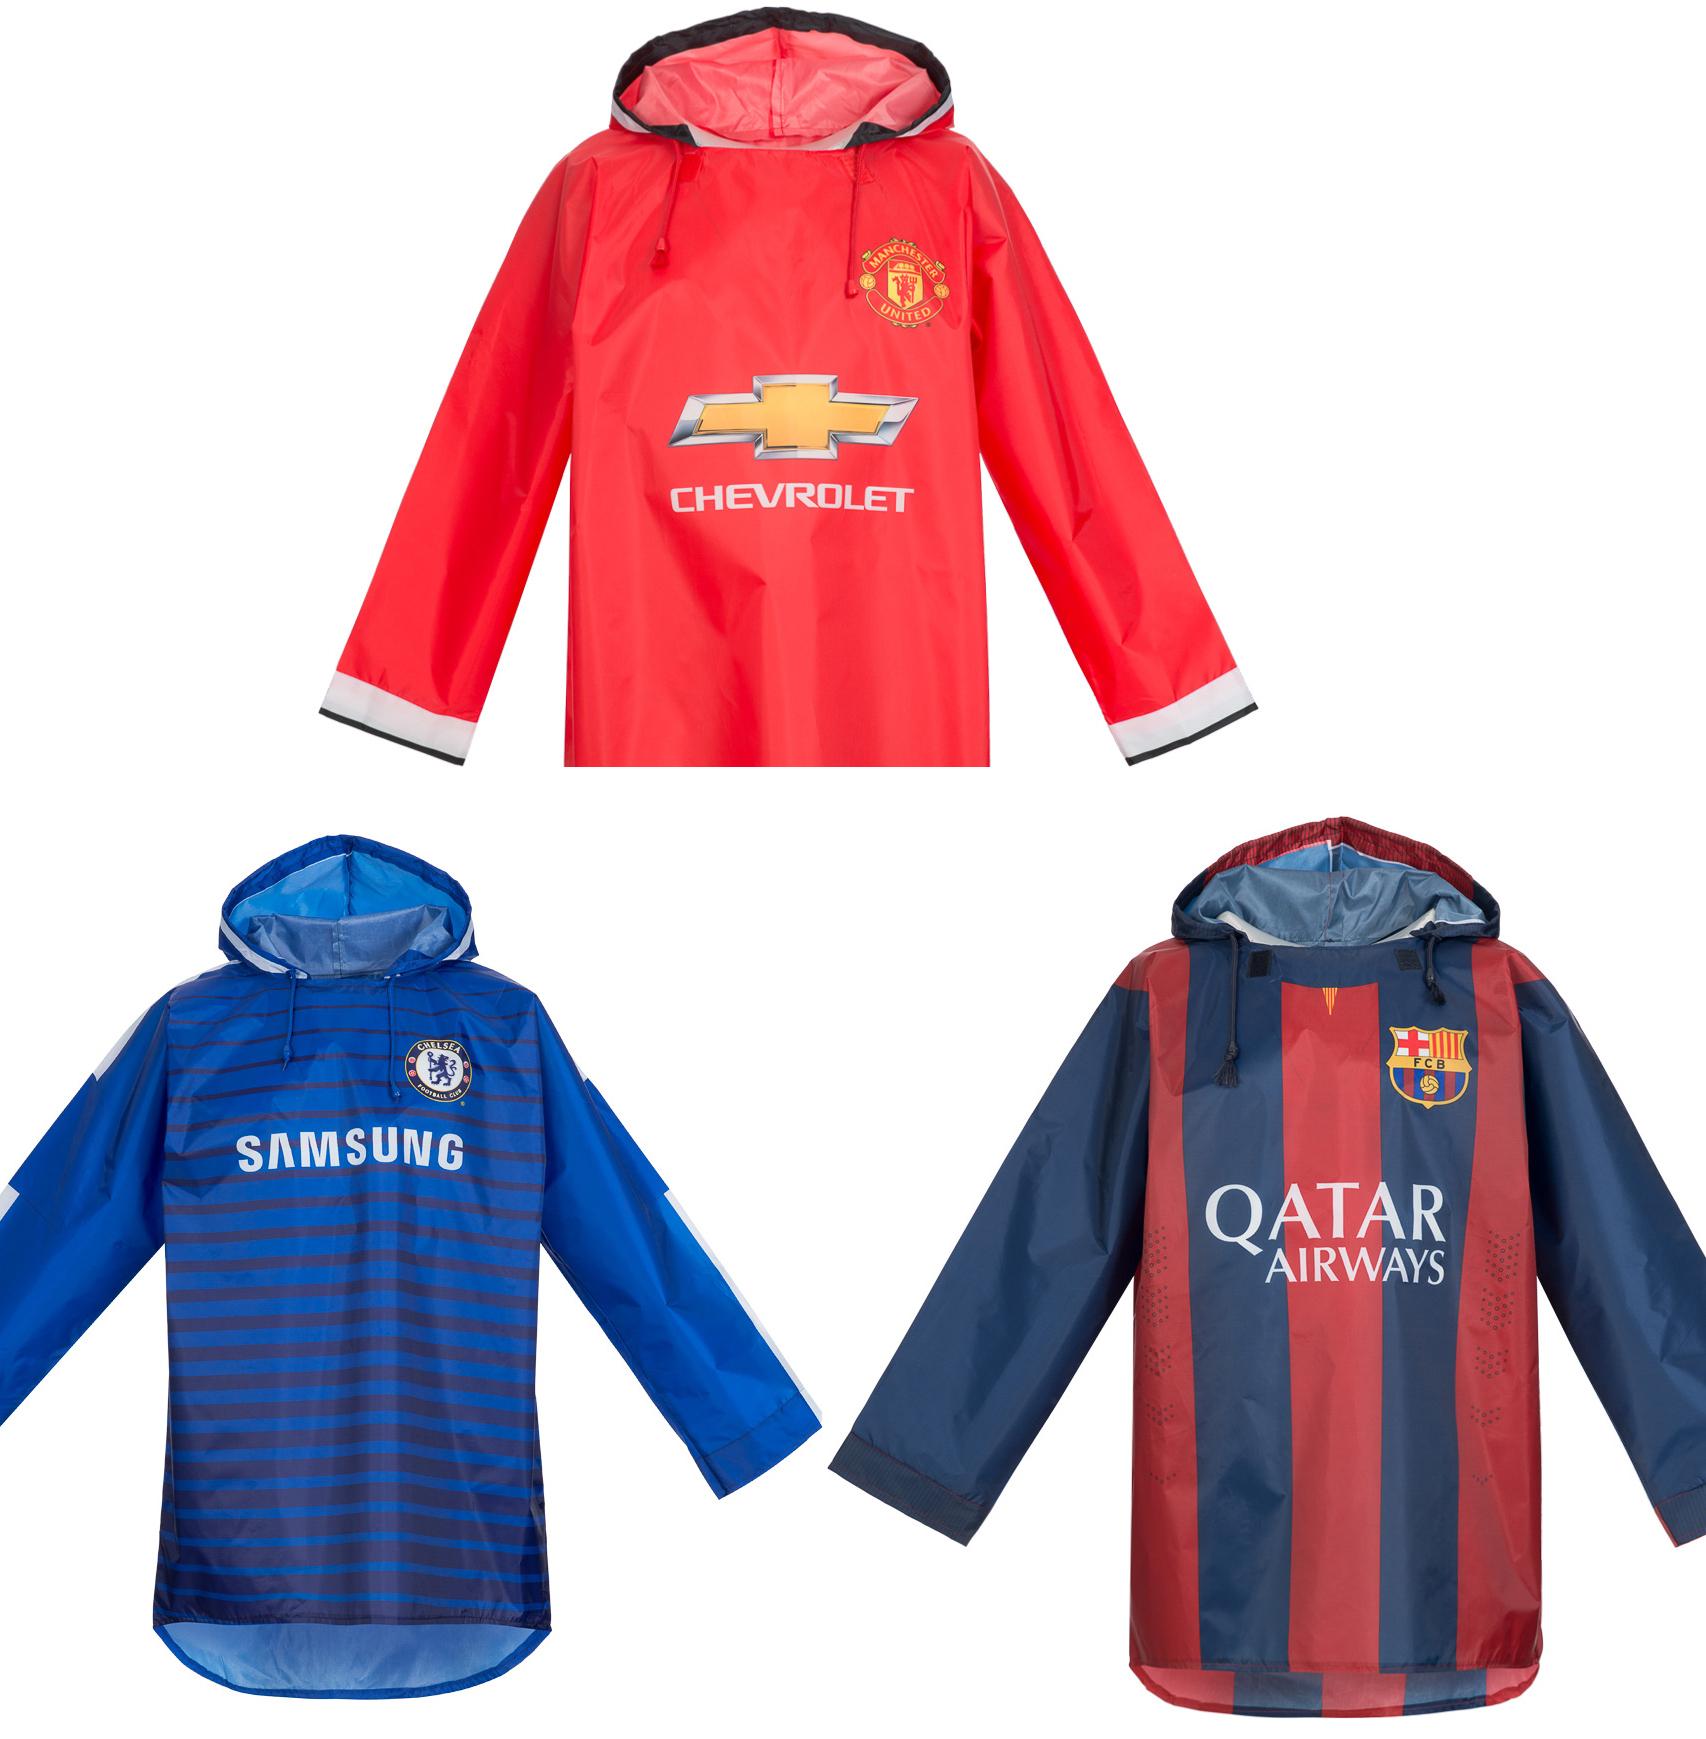 Regenponcho / Jacke von Chelsea, Barca, Manchester United (SPORTSPAR)